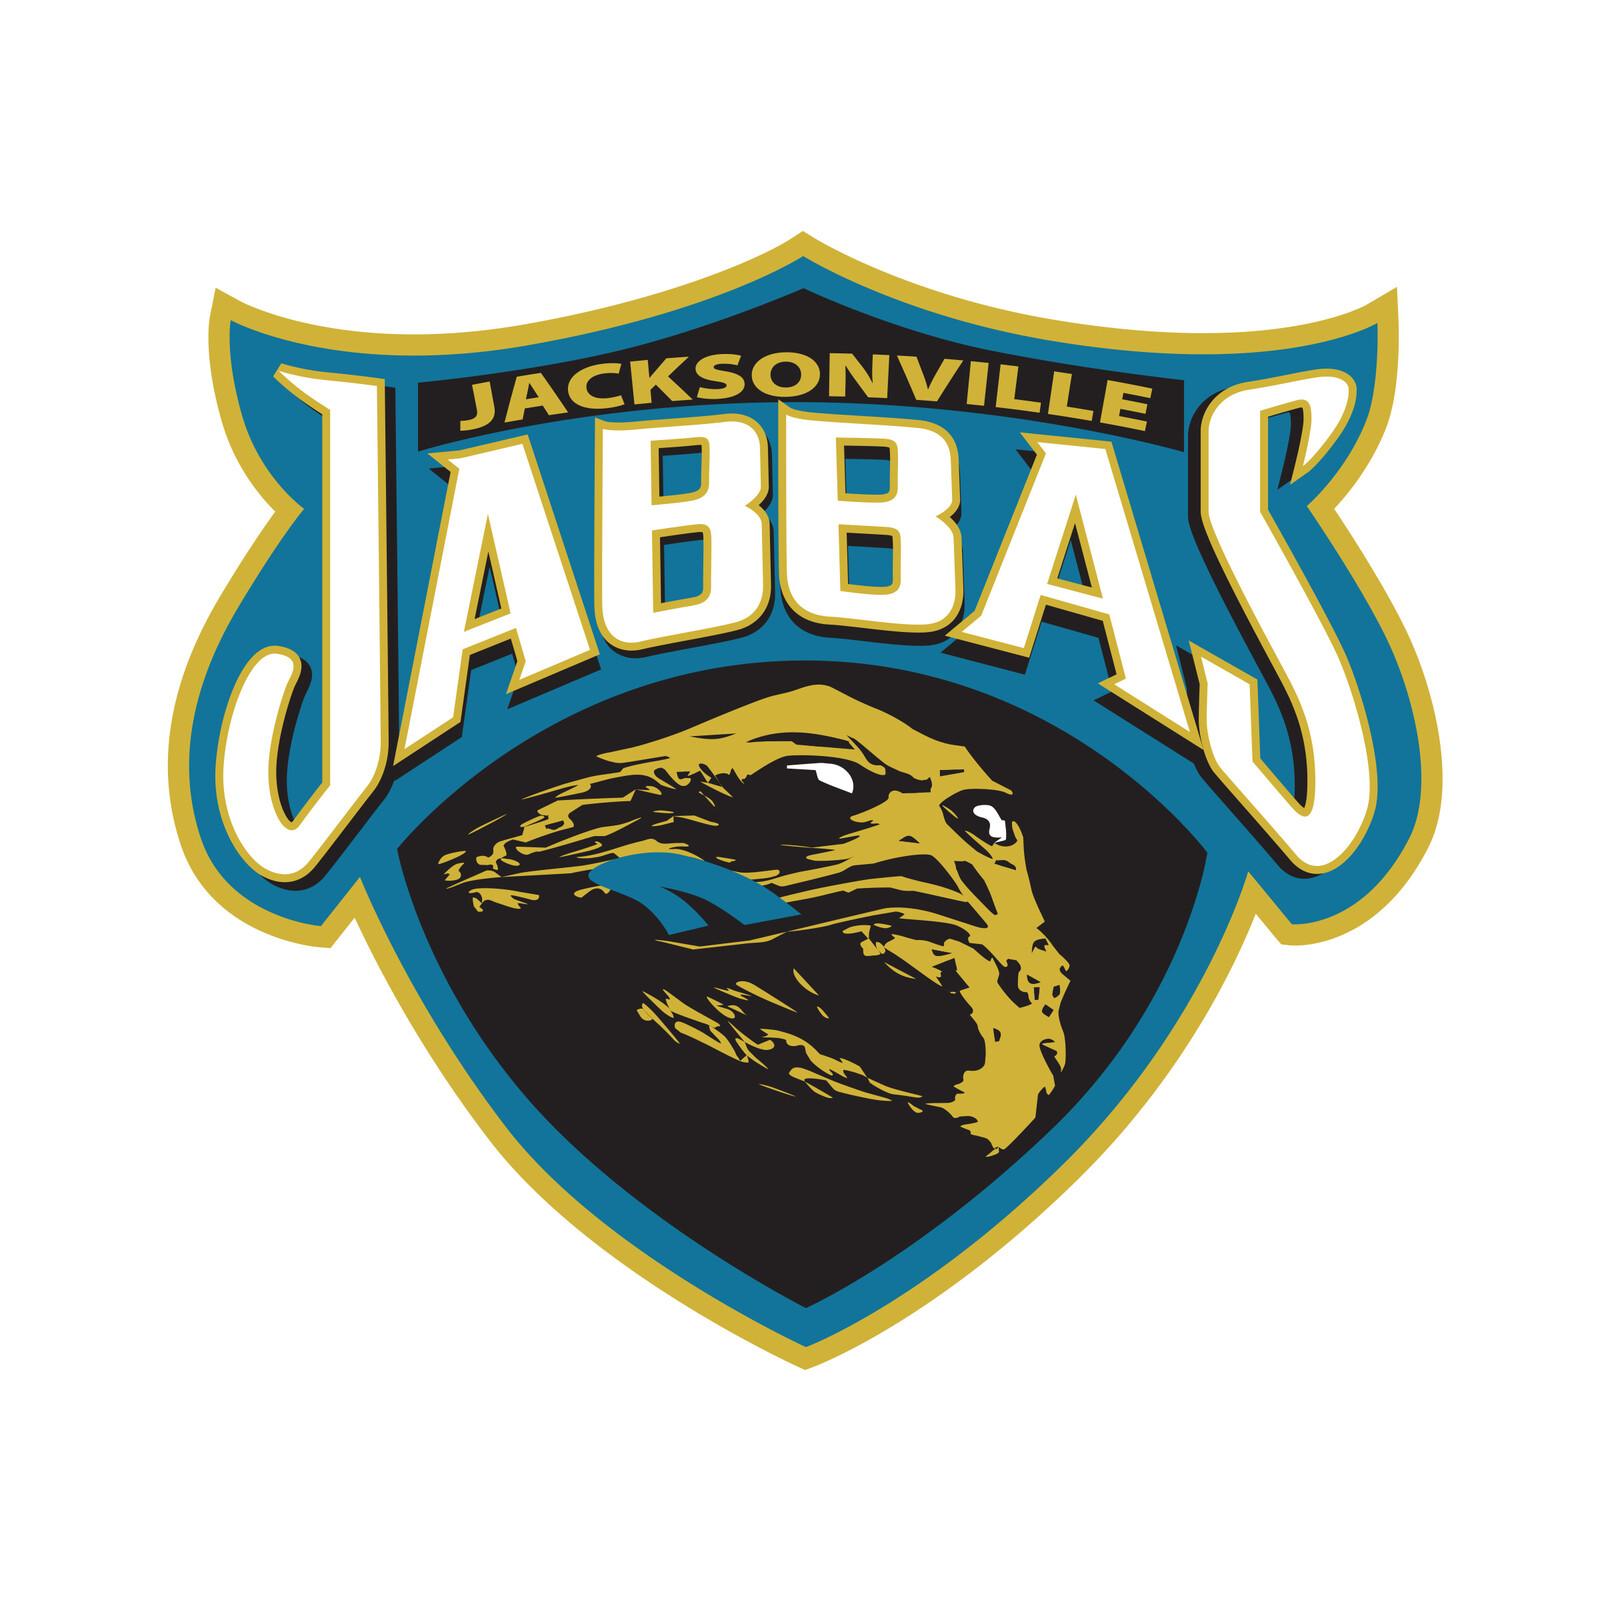 Jacksonville Jabbas